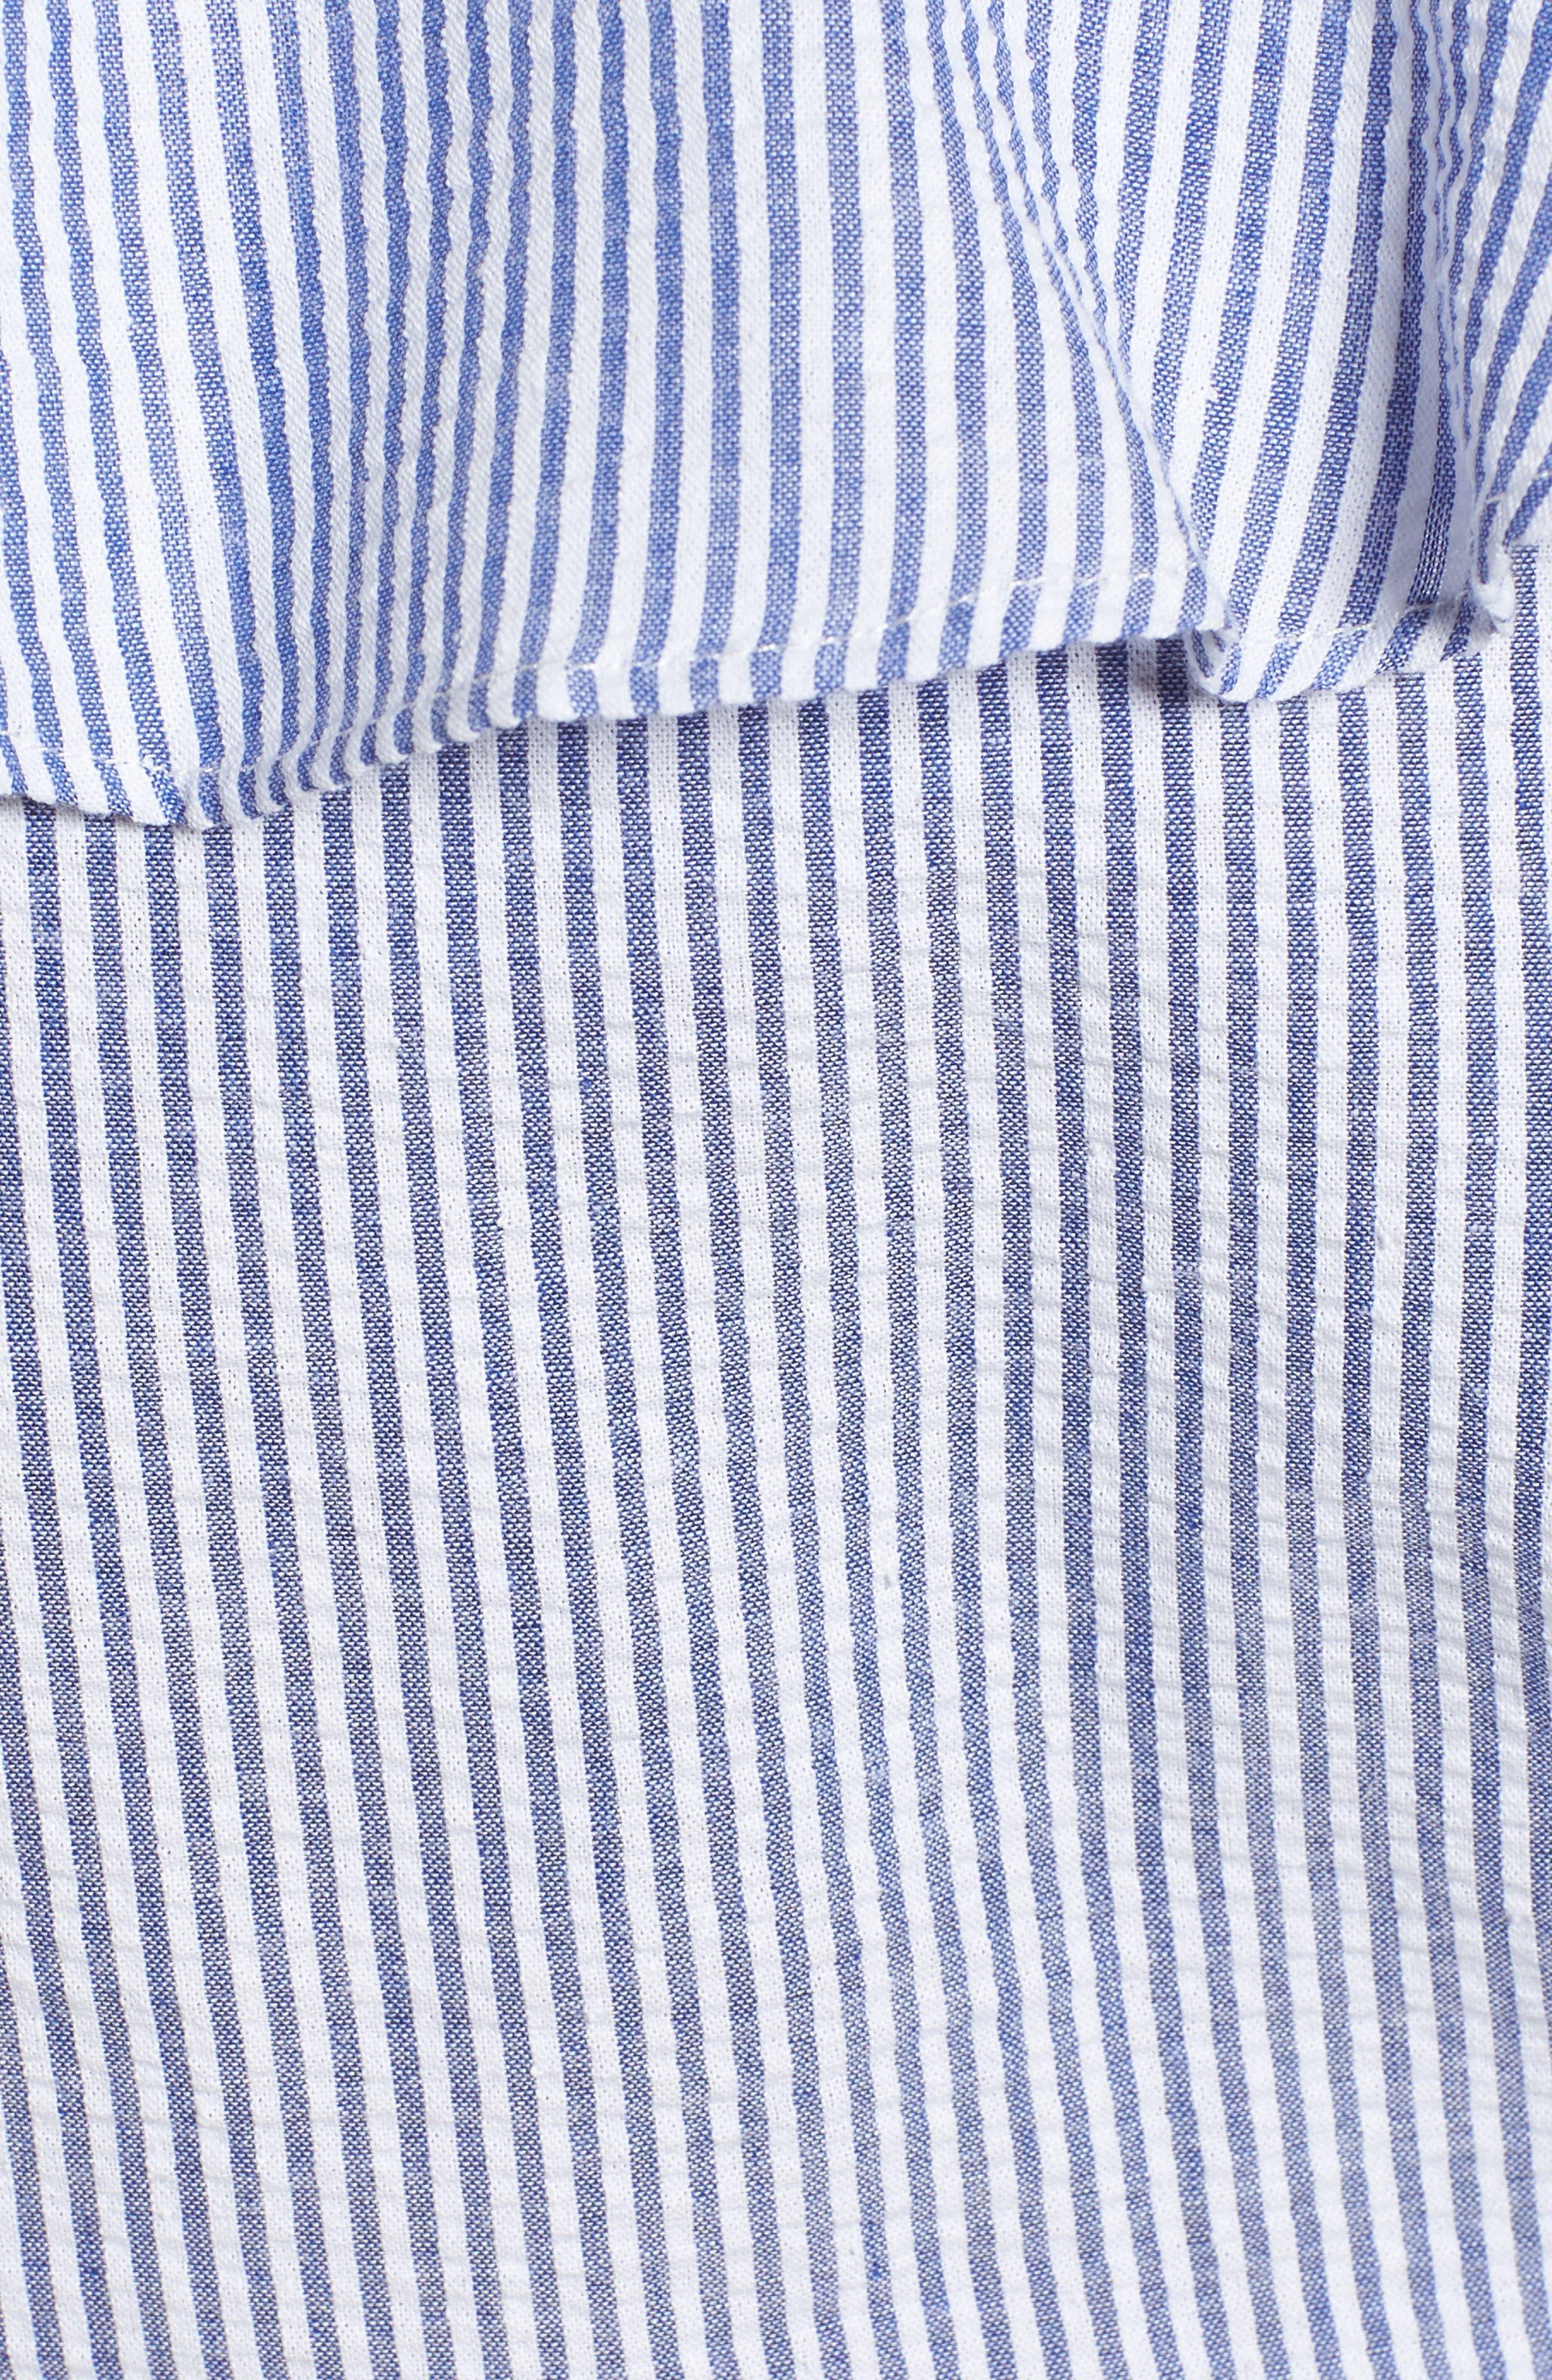 Ruffle Seersucker Crop Top,                             Alternate thumbnail 5, color,                             Indigo/ White Pucker Stripe